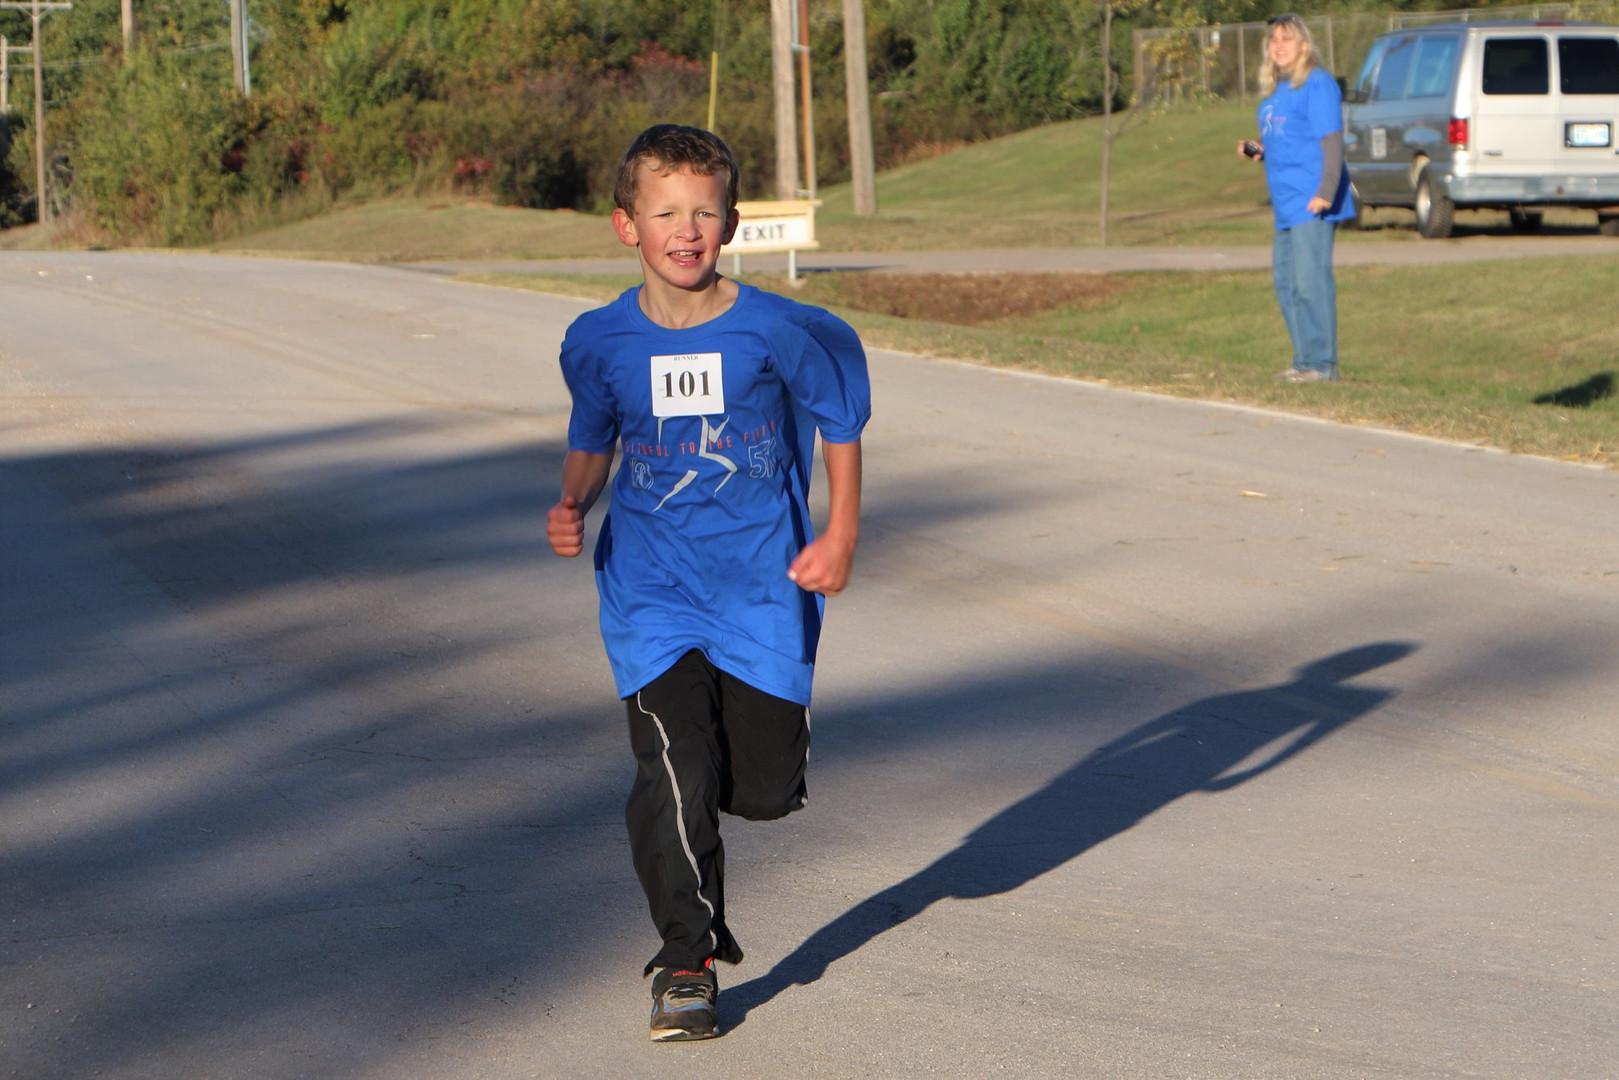 Oklahoma Academy 2018 5K Kid Runner